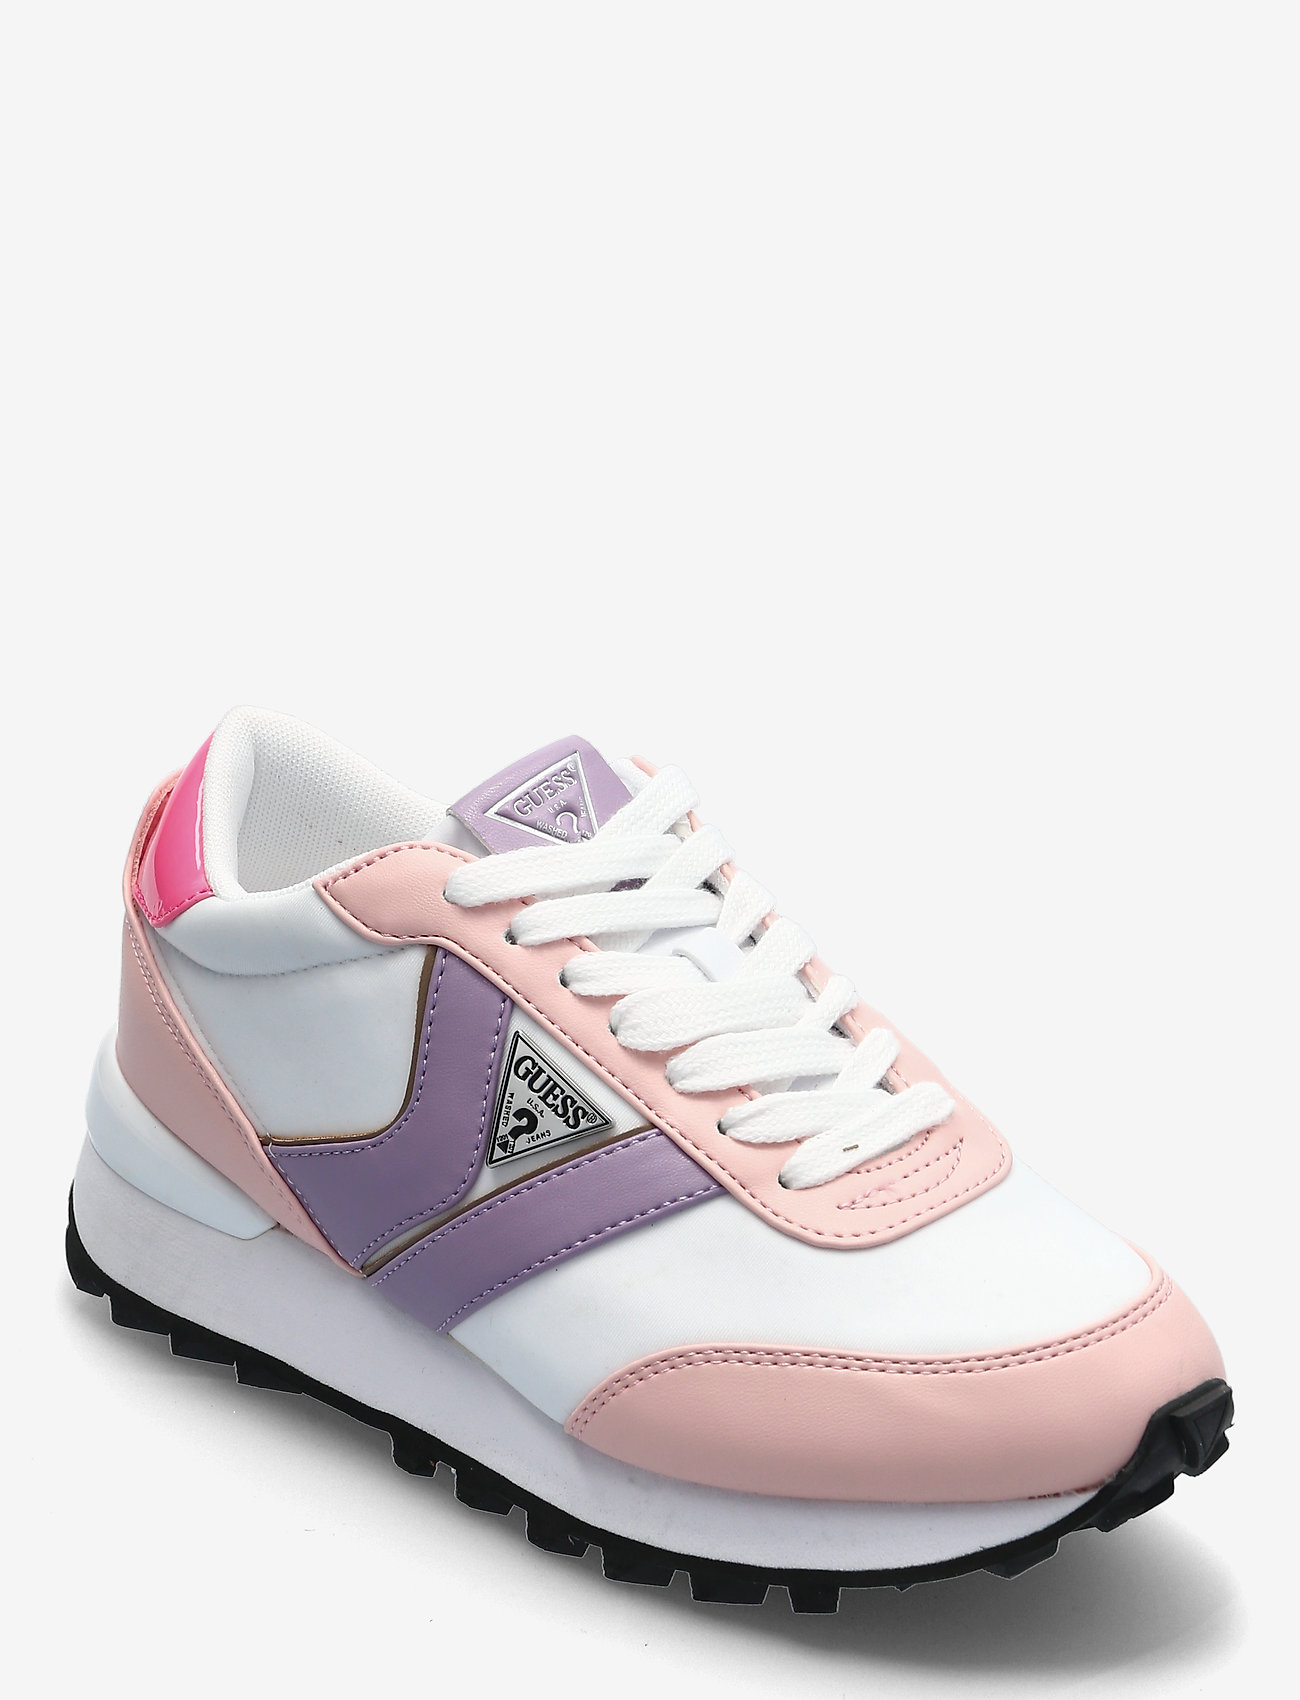 GUESS - SAMSIN/ACTIVE LADY/FABRIC - låga sneakers - whipi - 0